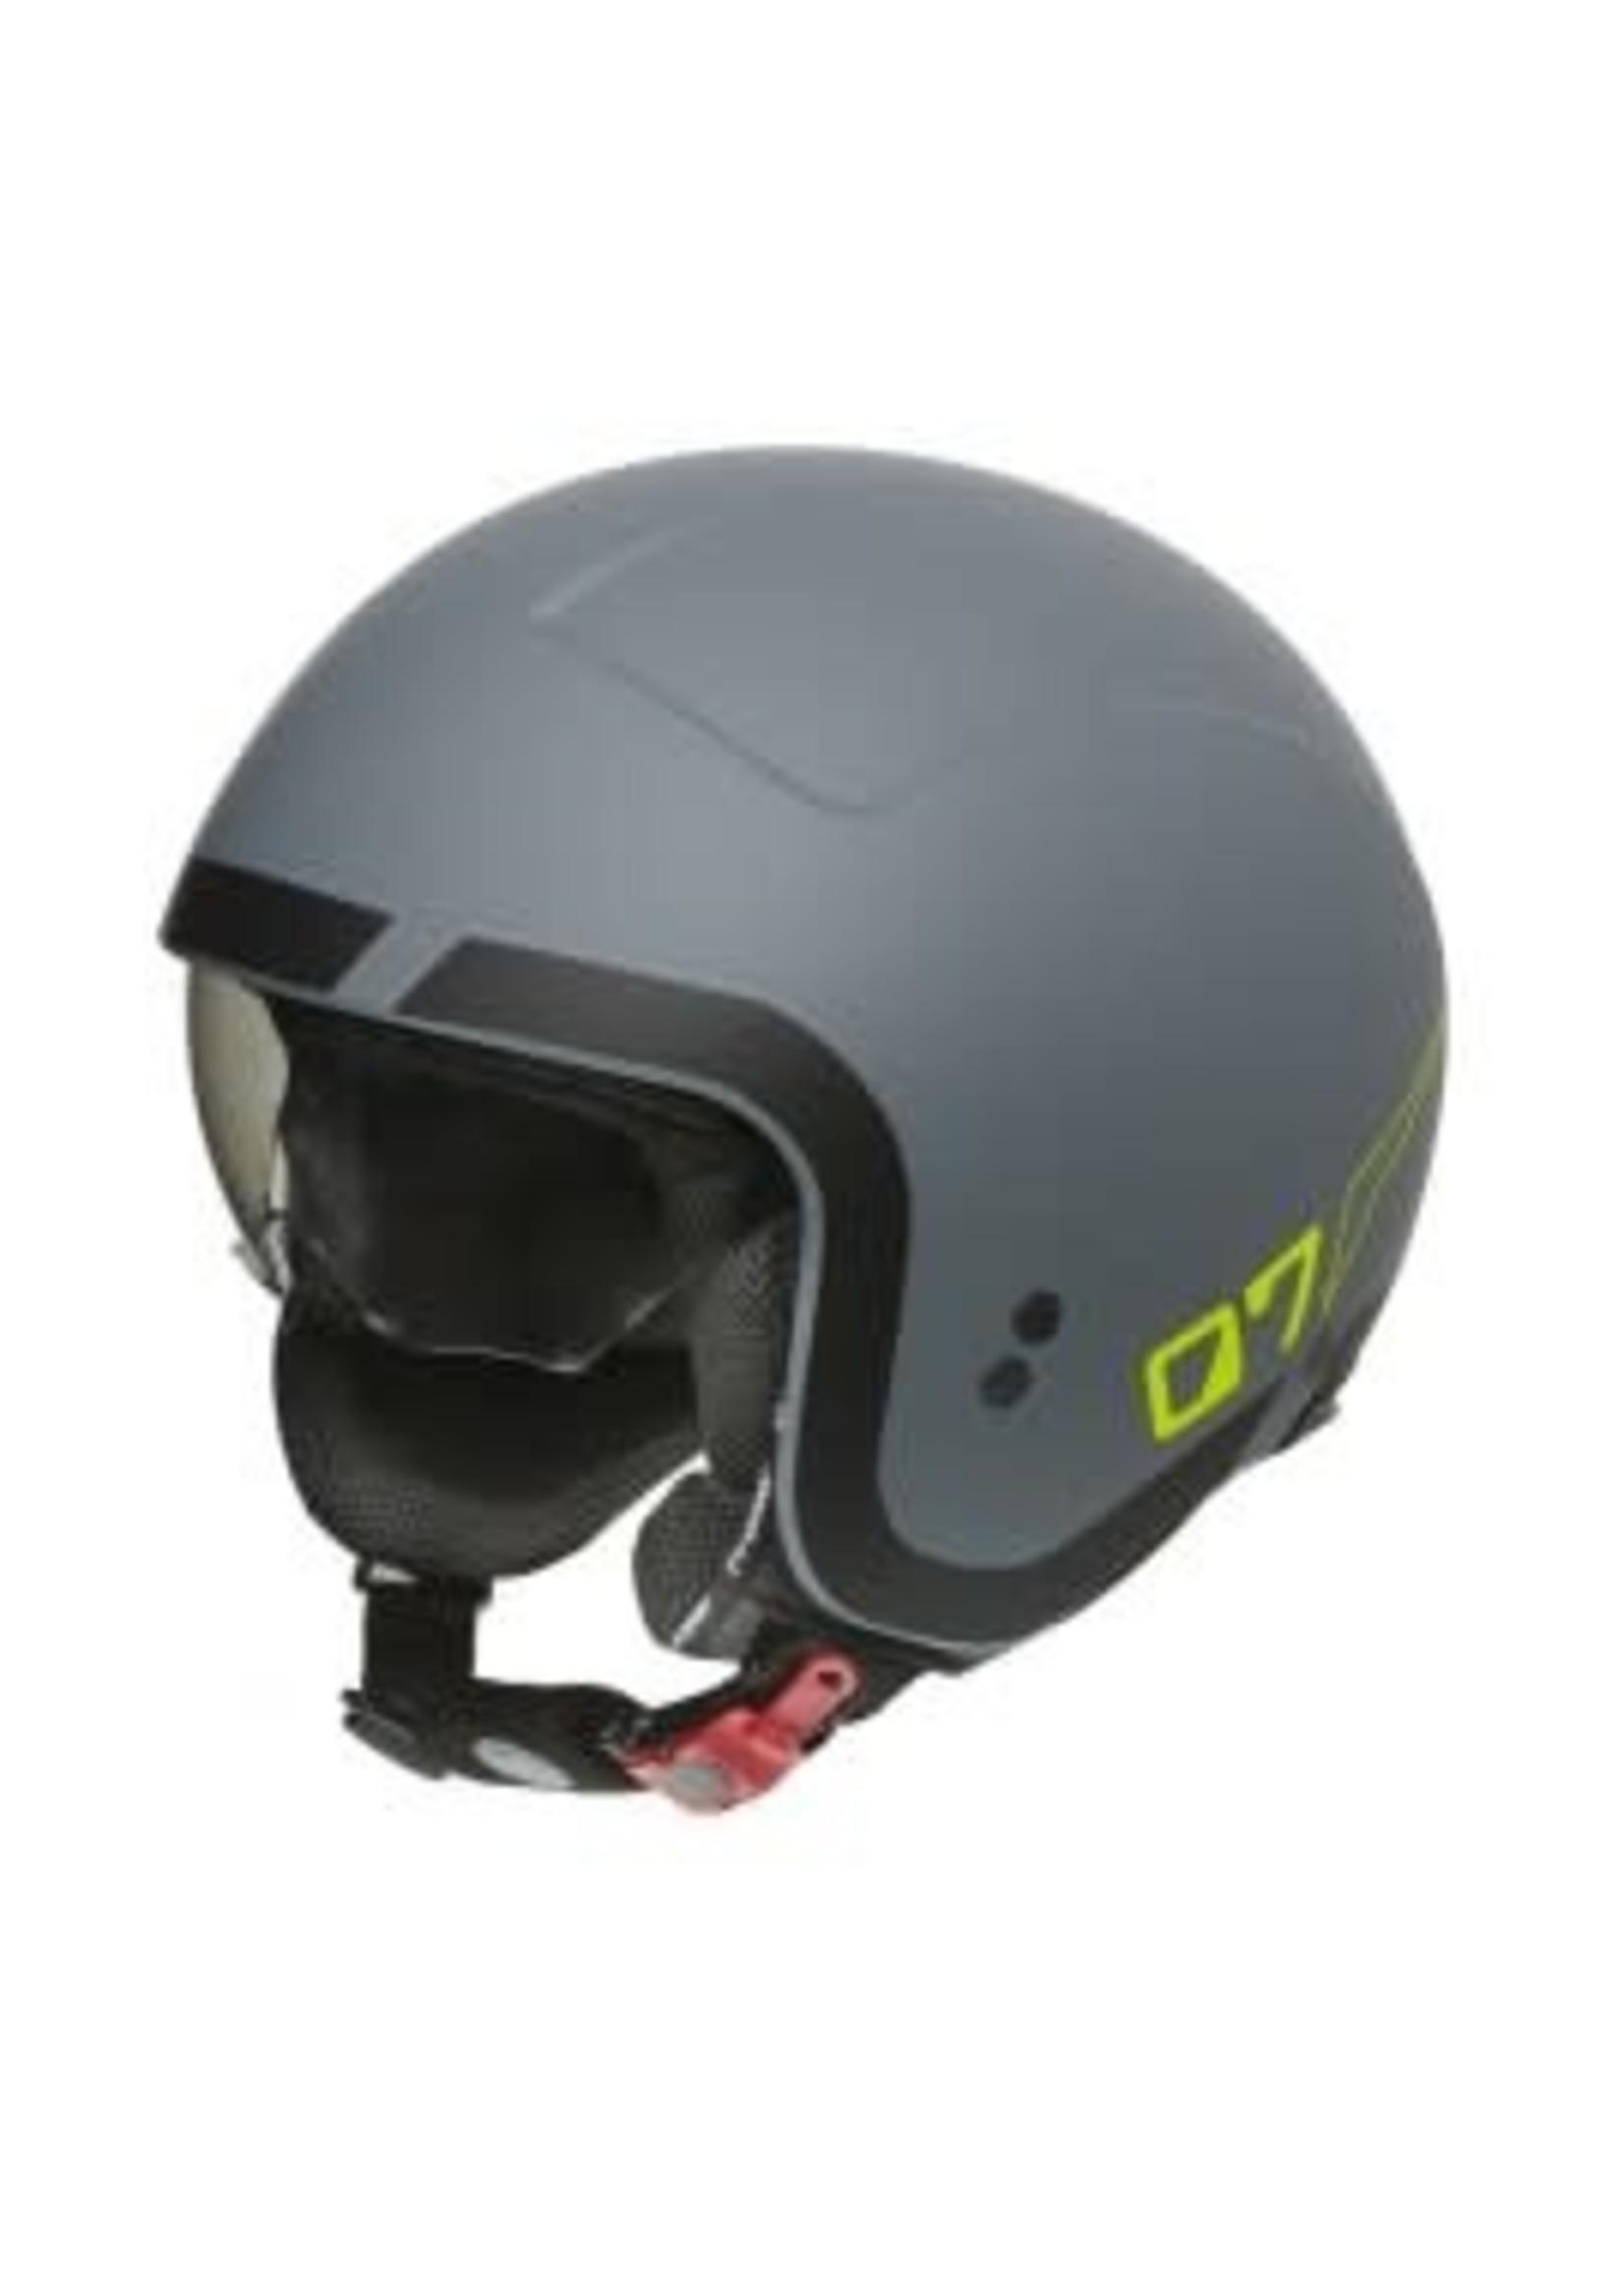 Premier Premier Rocket Helm Grey BM